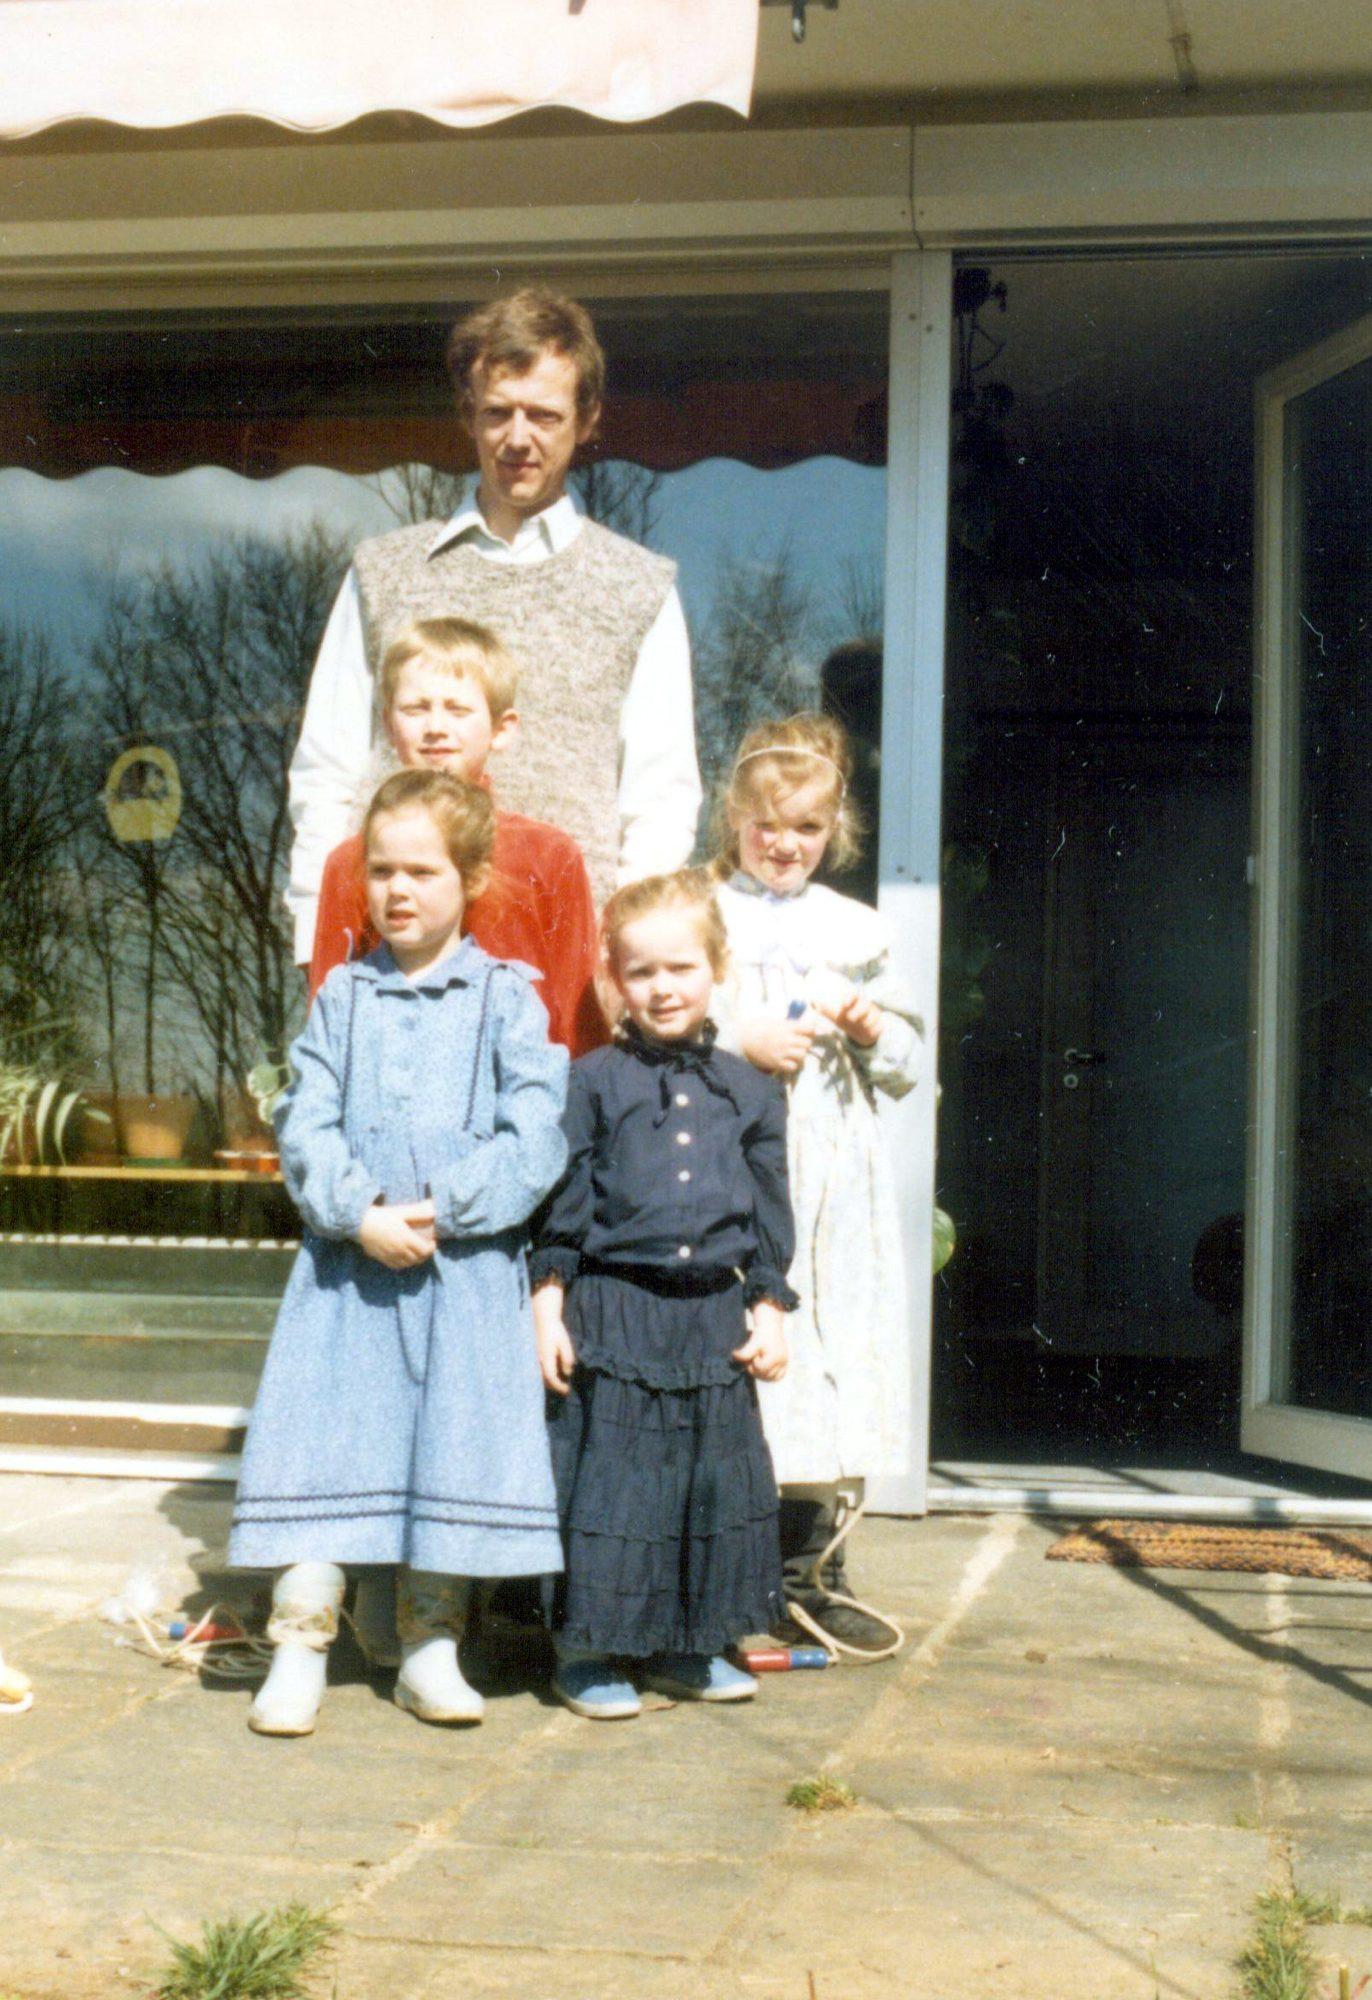 1988 - Vater mit Kindern